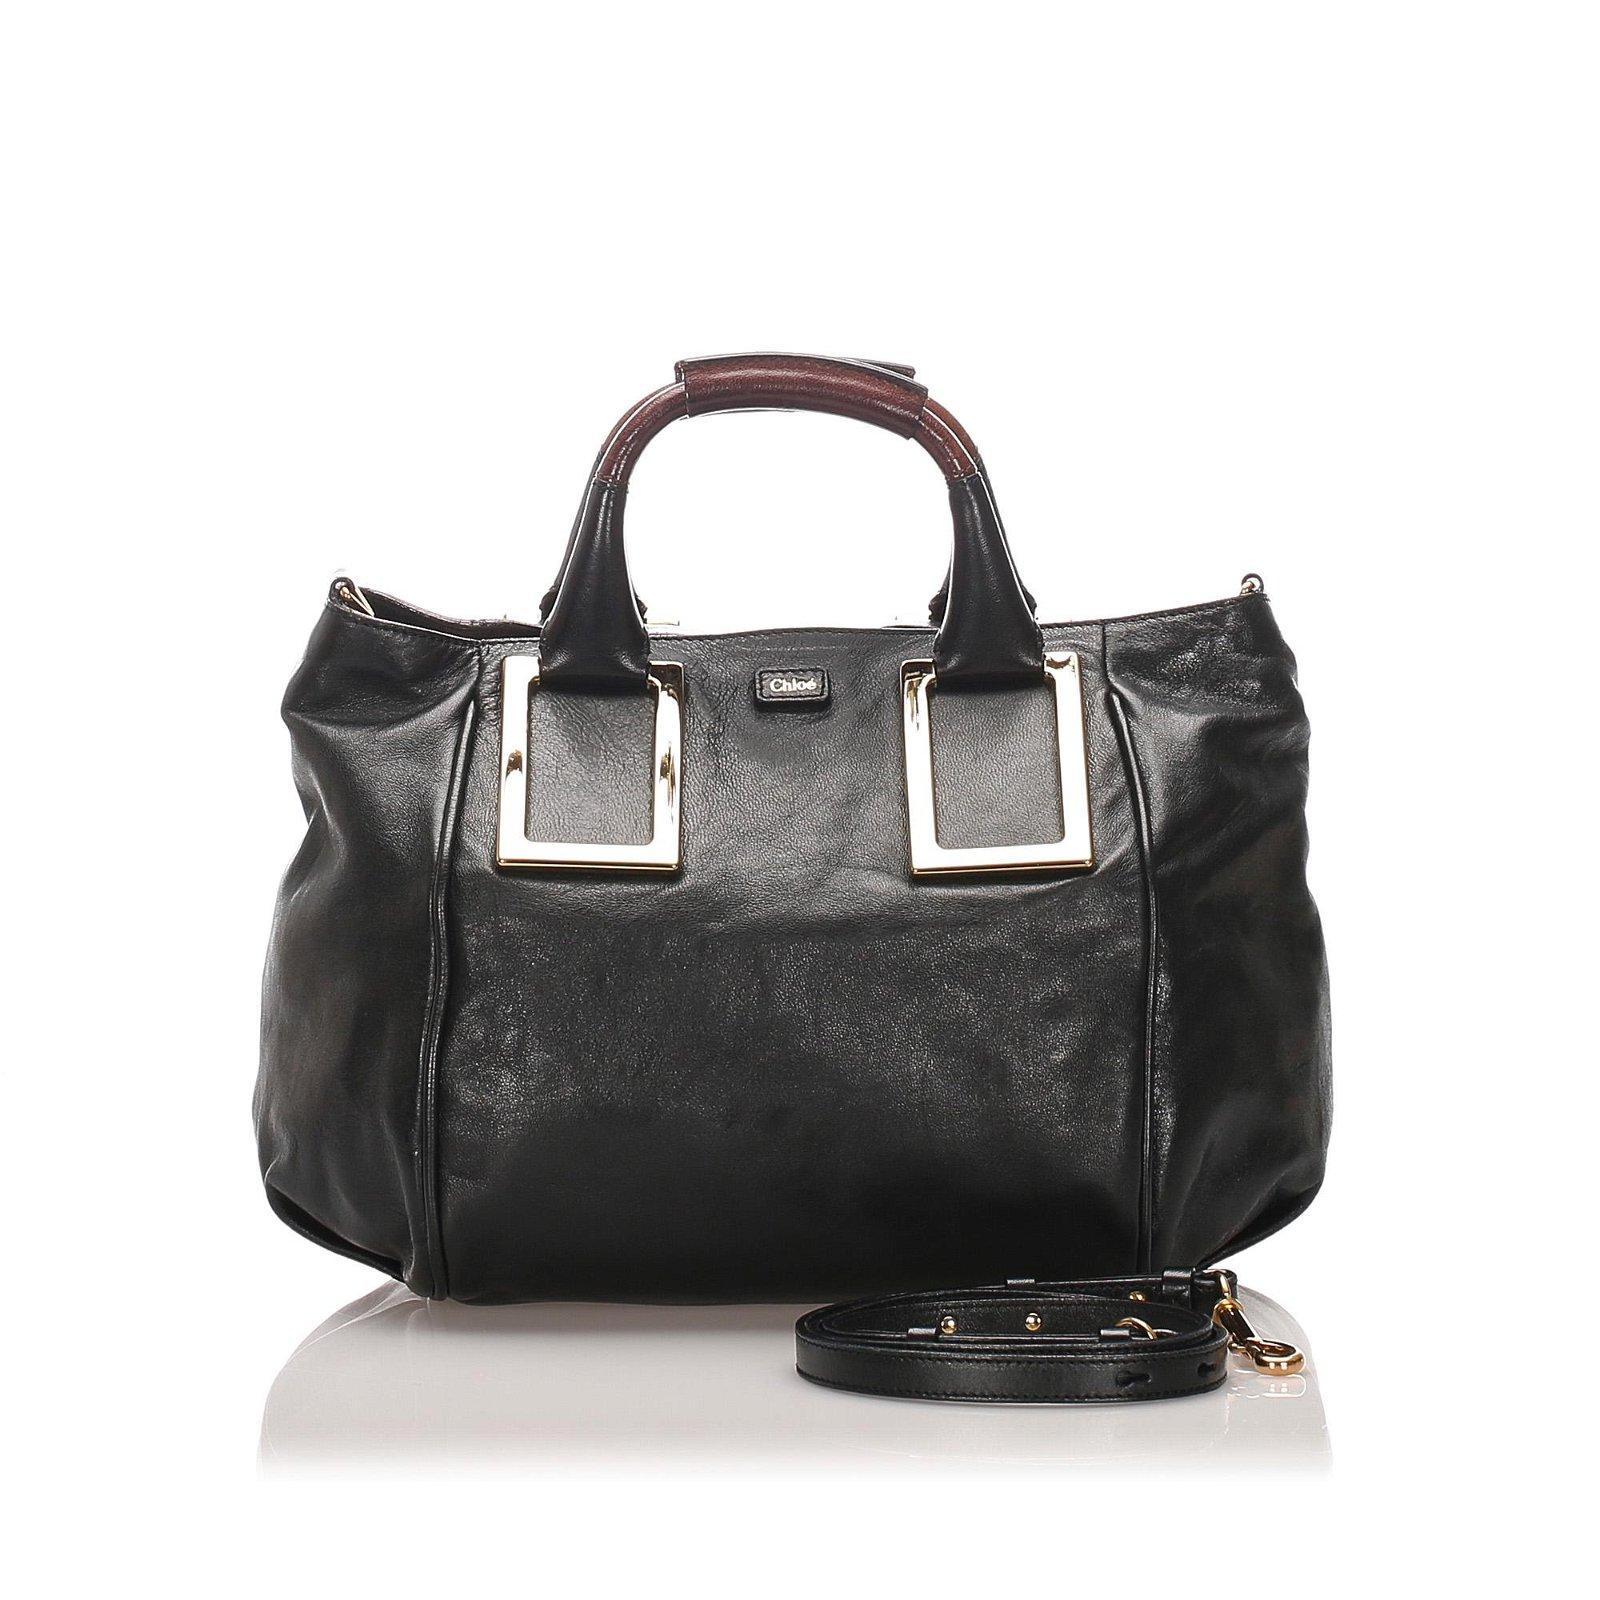 Authentic Chloe Leather Ethel Satchel